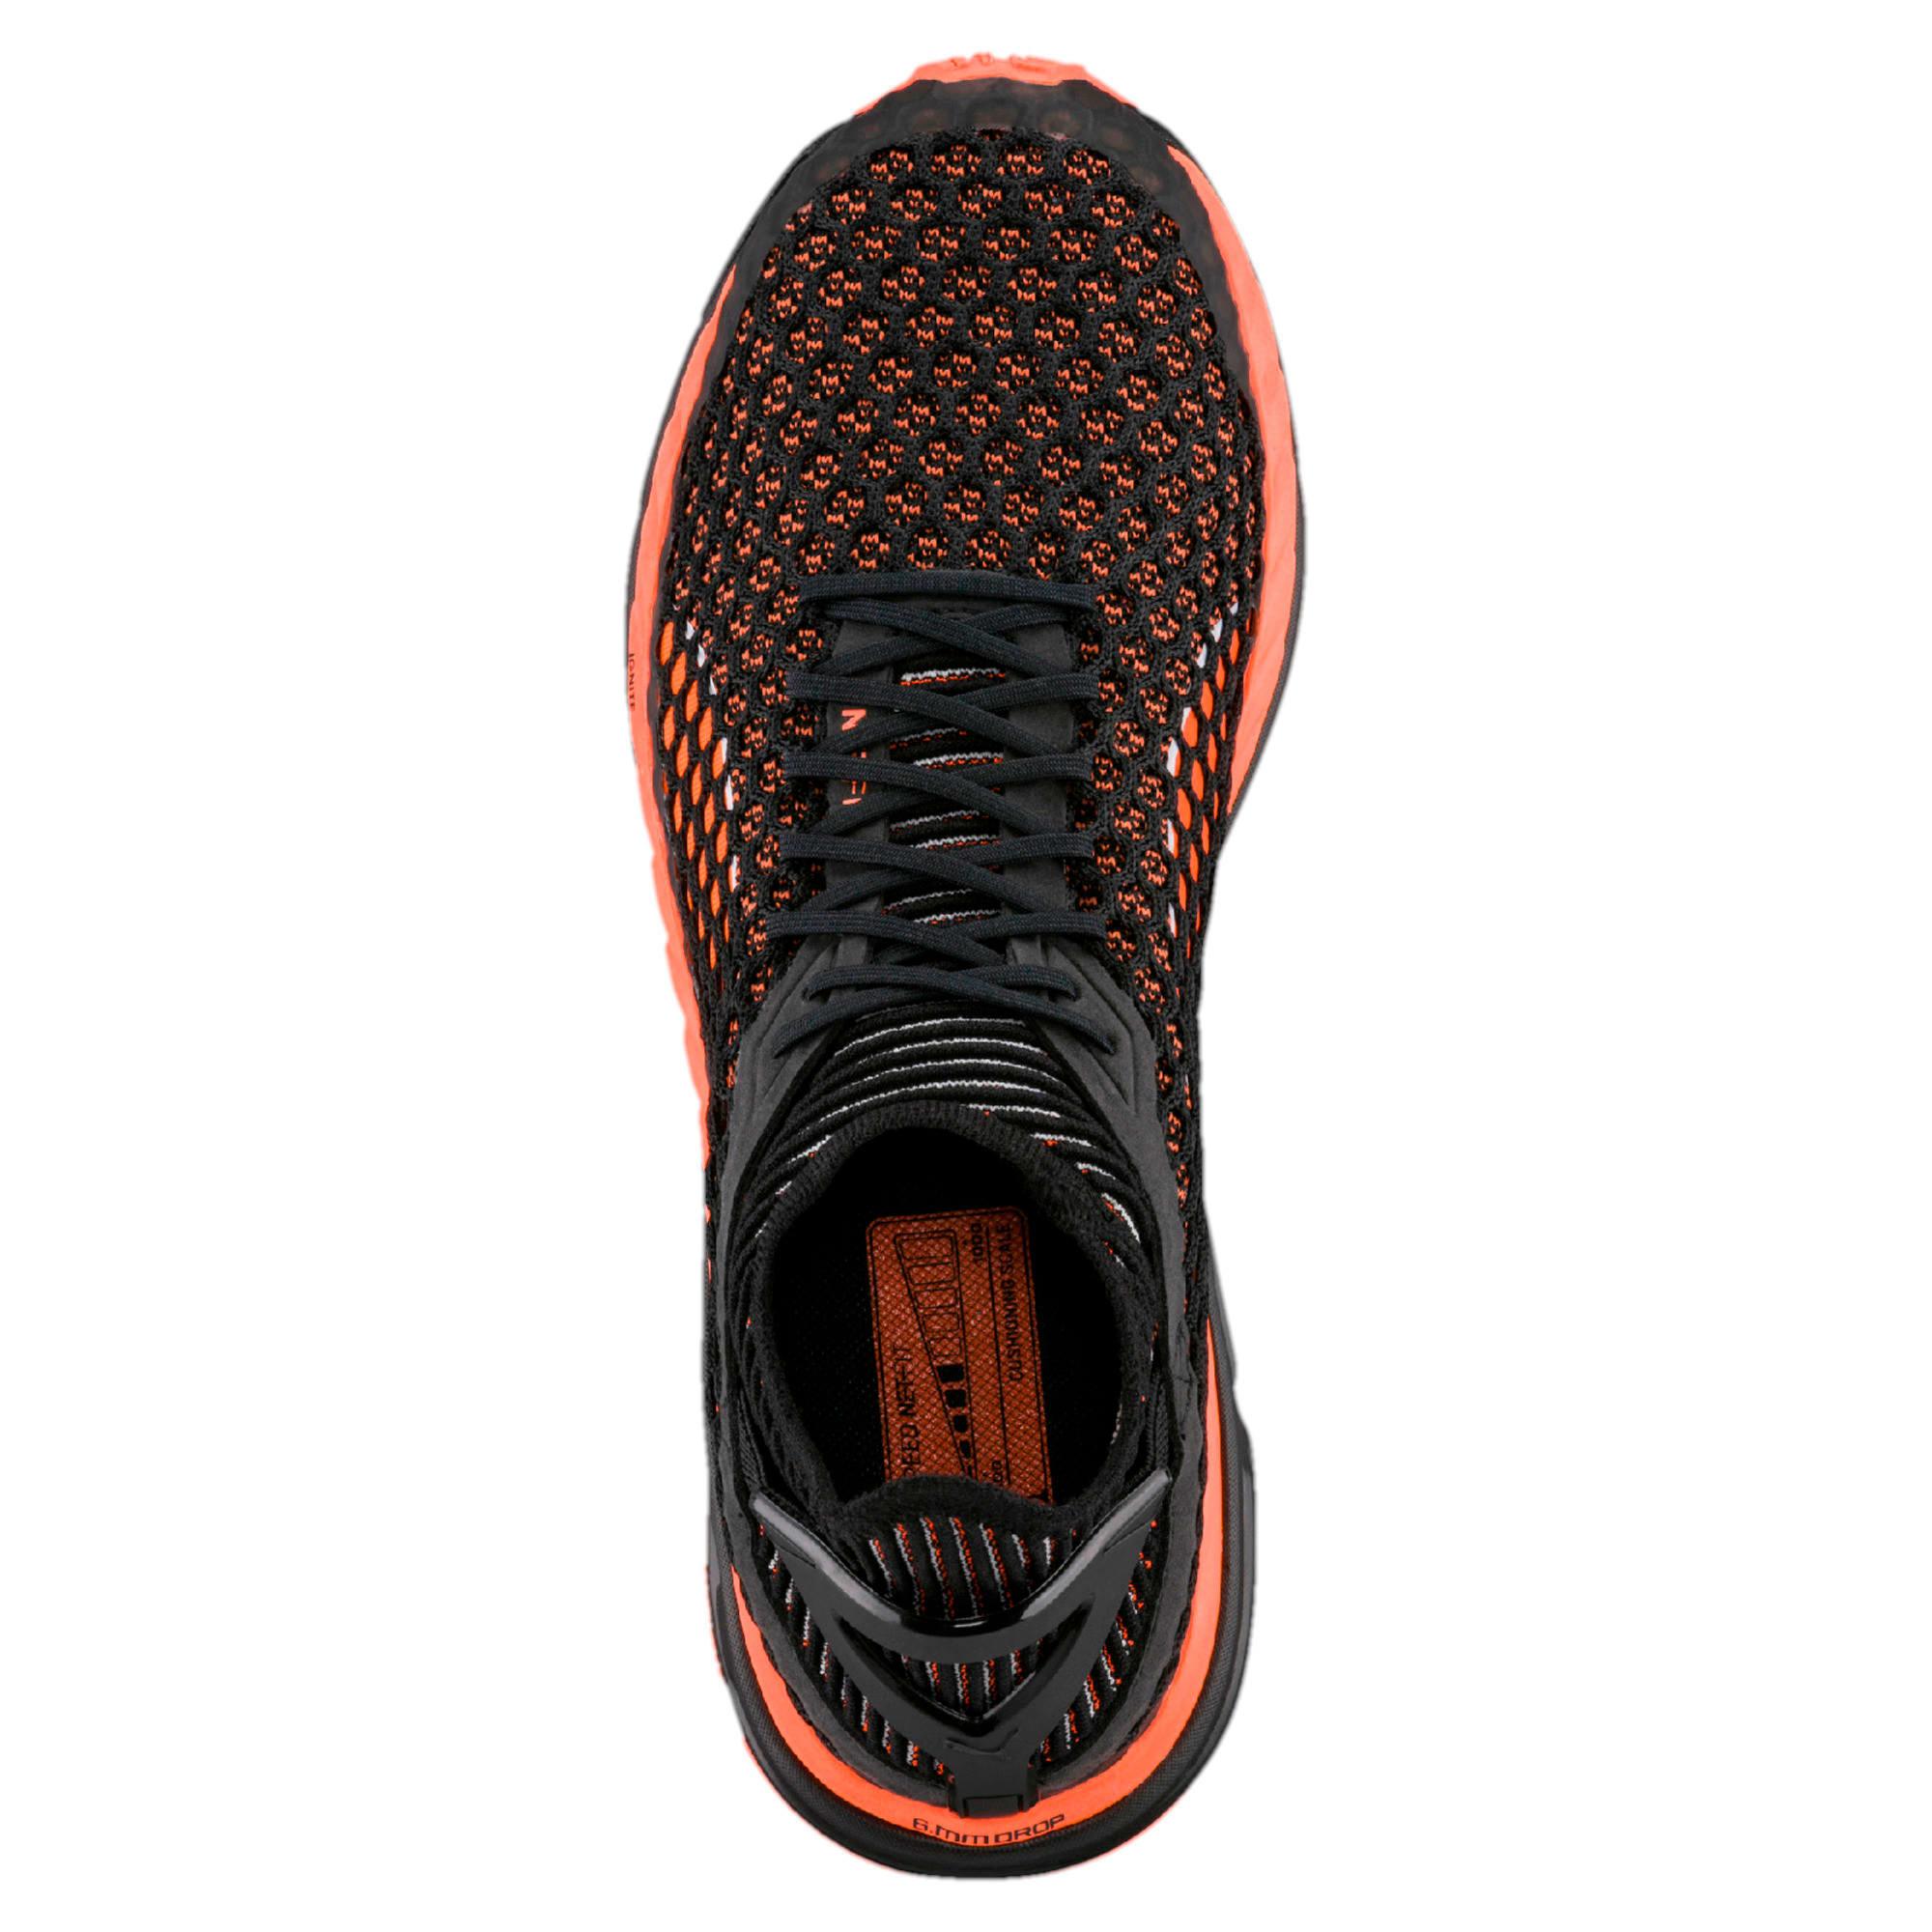 Thumbnail 5 of Speed IGNITE NETFIT Men's Running Shoes, Black-Shocking Orange-White, medium-IND